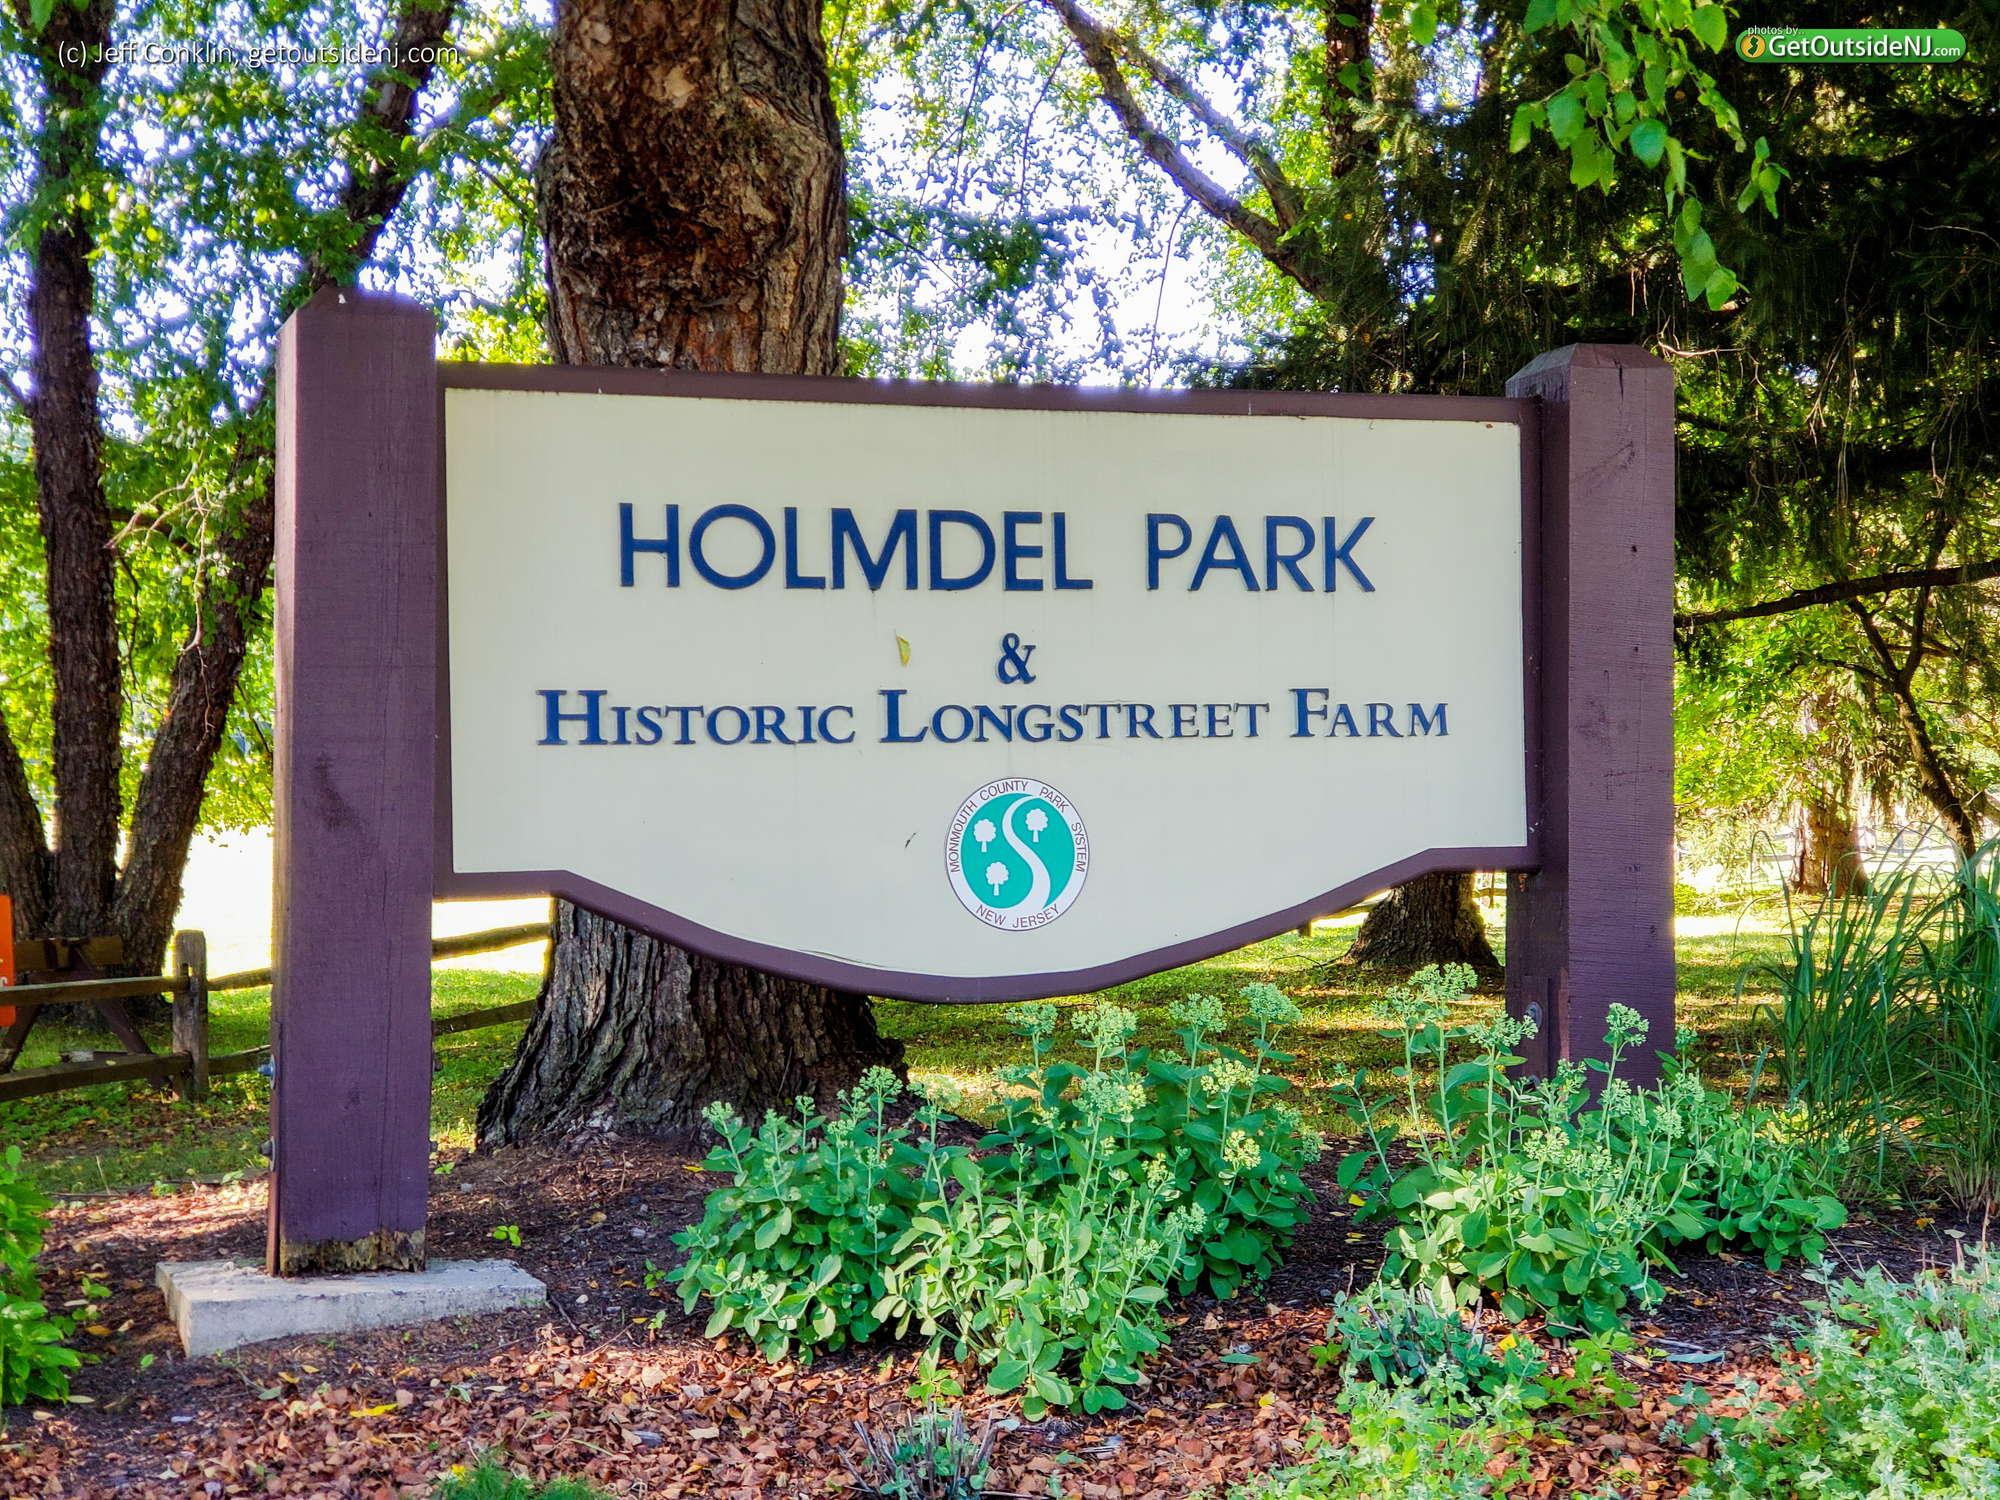 Historic Longstreet Farm 44 Longstreet Road Holmdel Nj 07733